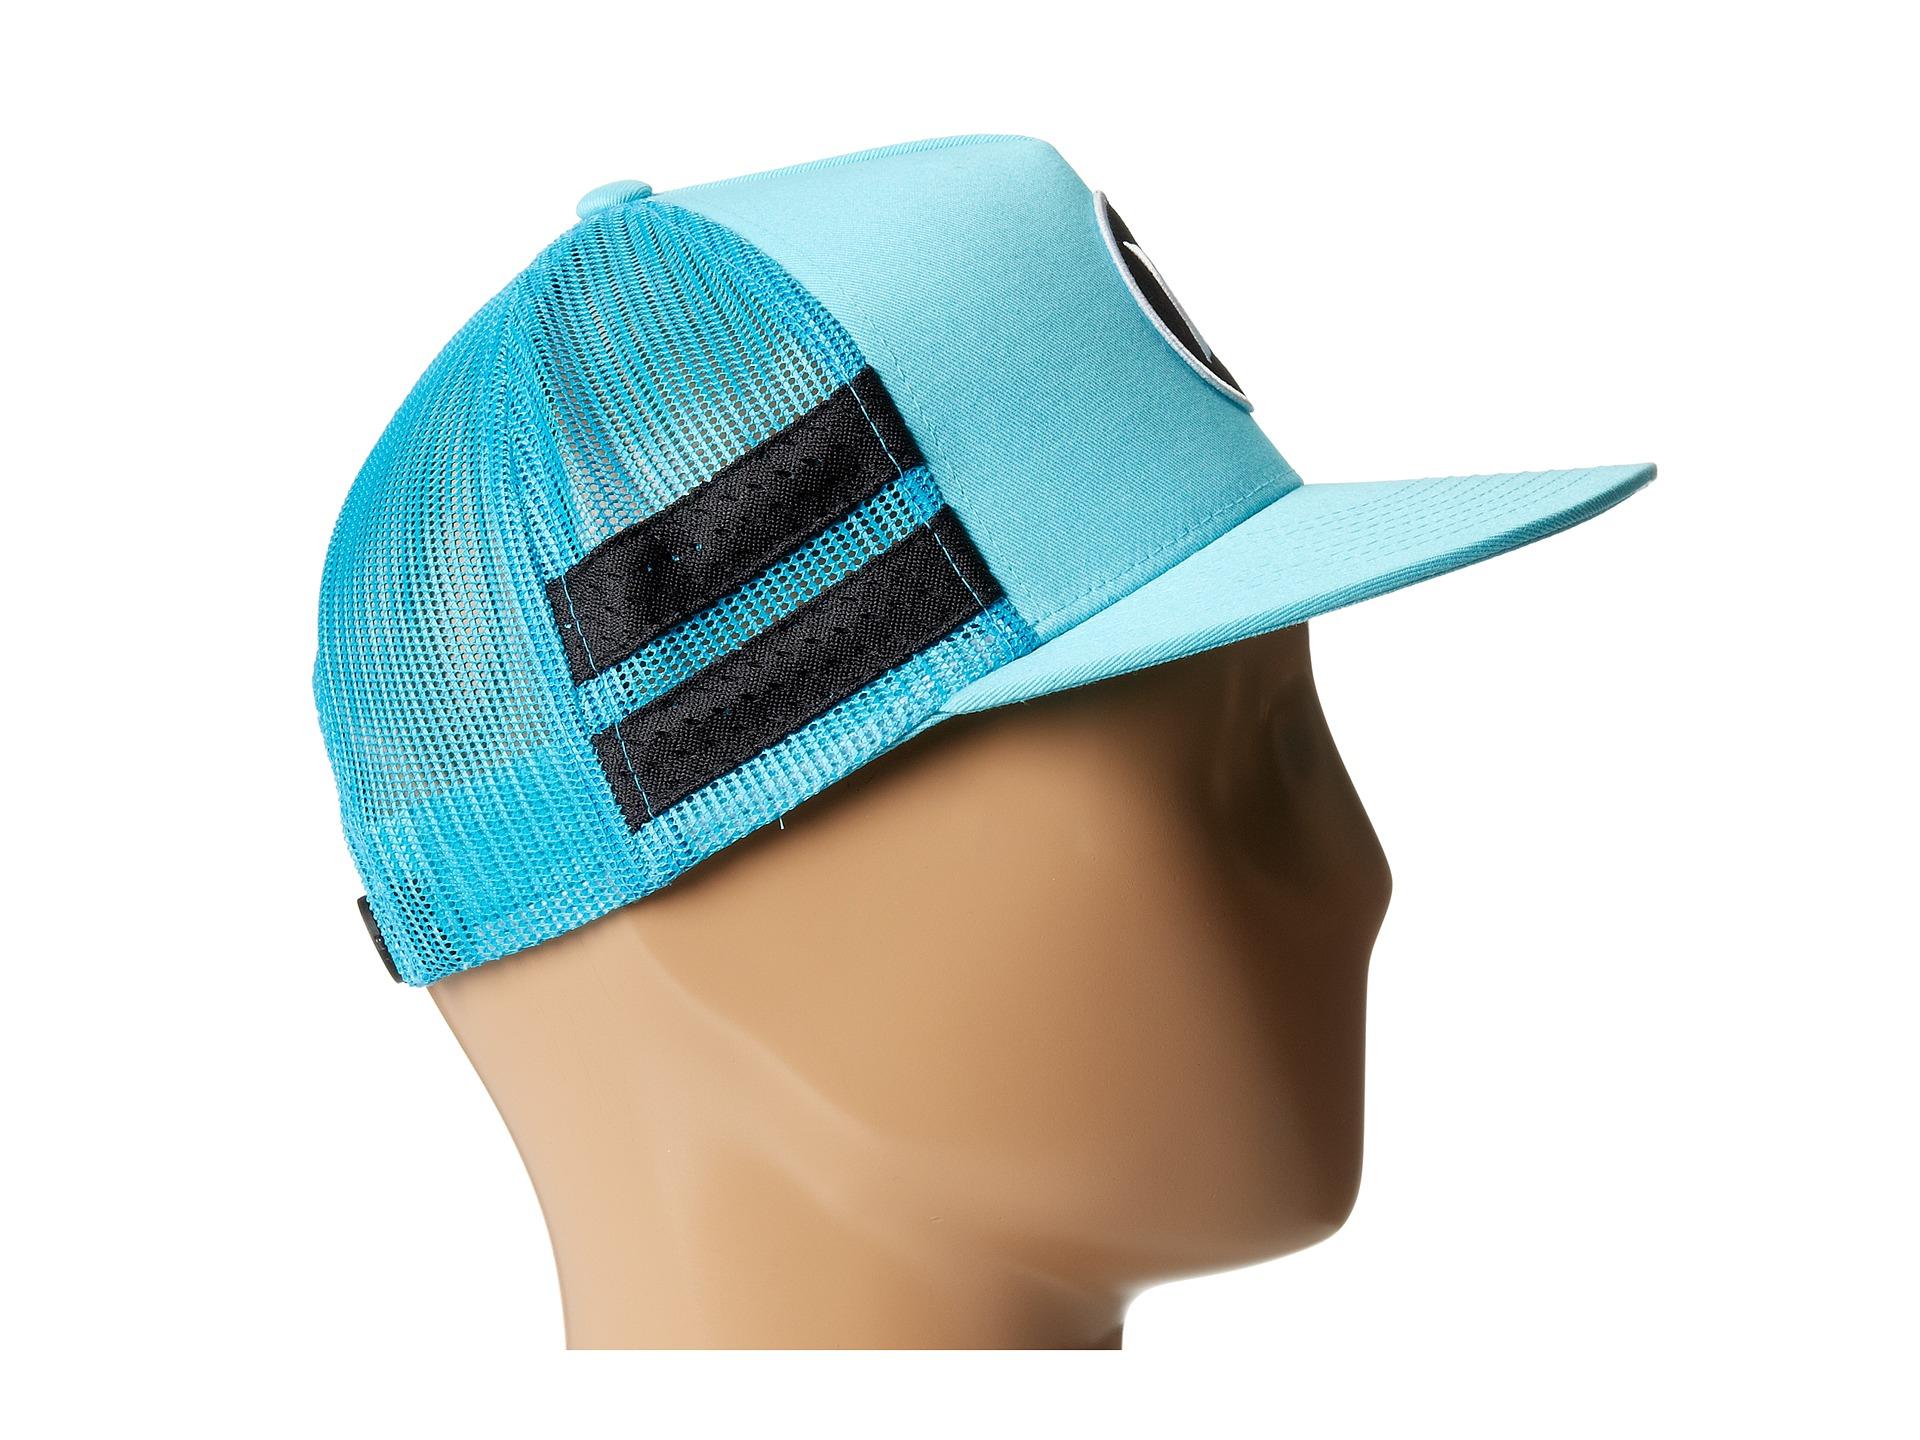 Lyst - Hurley Block Party Movement Trucker Hat in Blue for Men 4e9e020e4dd4